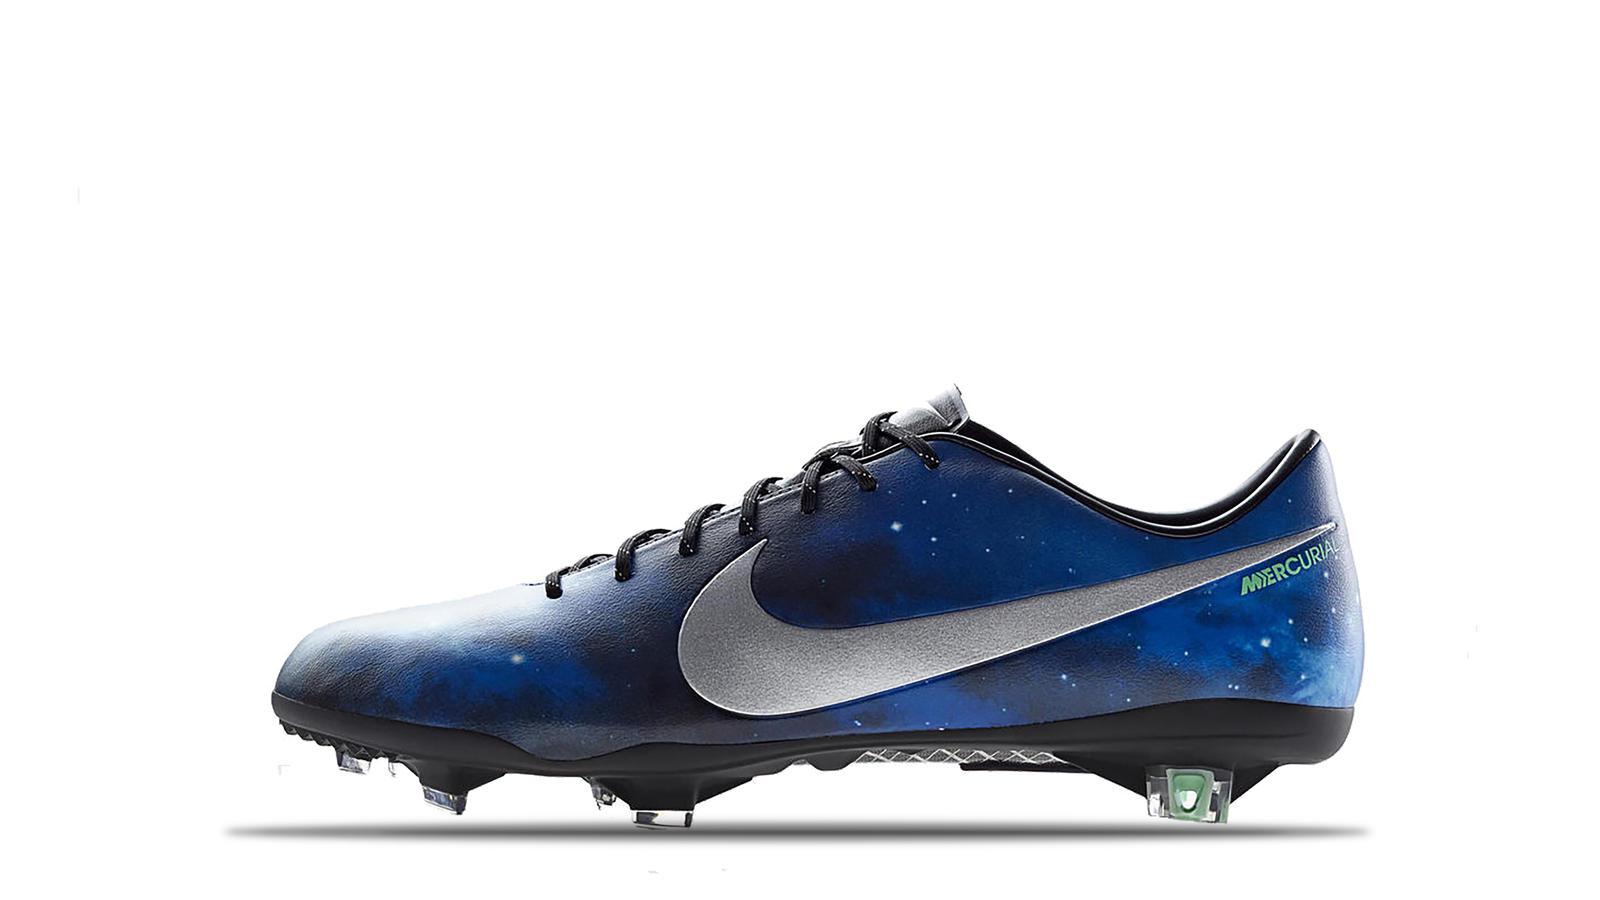 Nike and Cristiano Ronaldo Extend Long